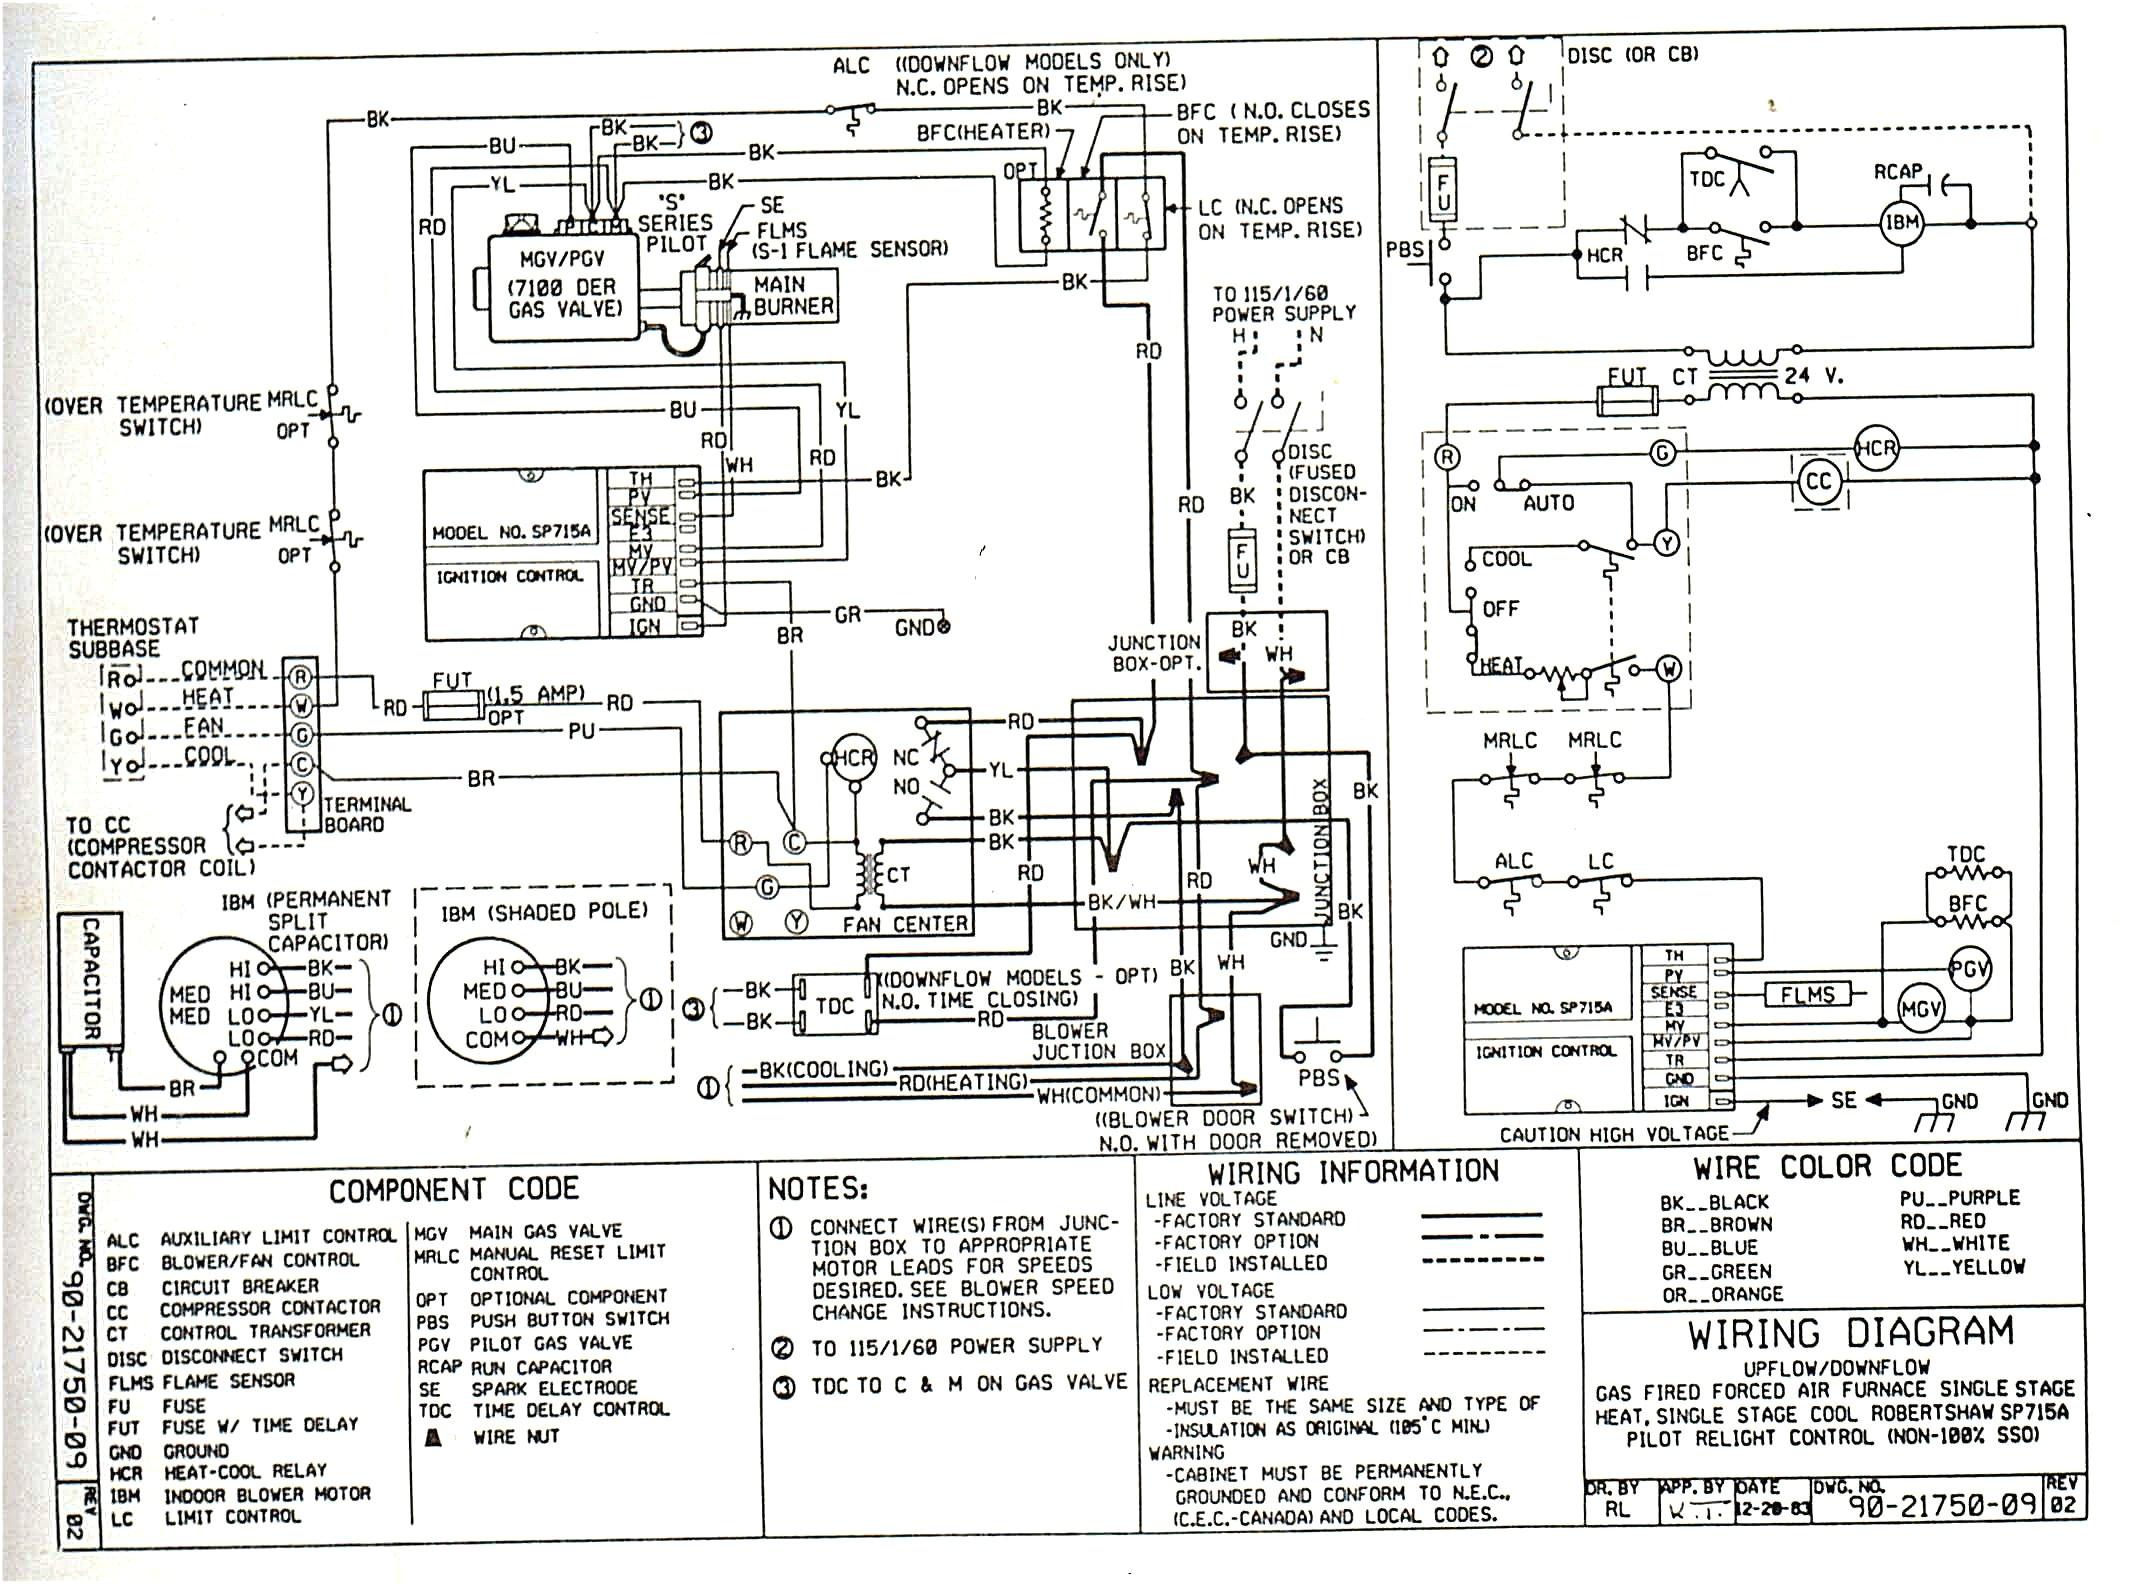 12 volt coil wiring diagram firetrucksandequipment tpub tm wiring mix 12 volt coil wiring diagram firetrucksandequipment